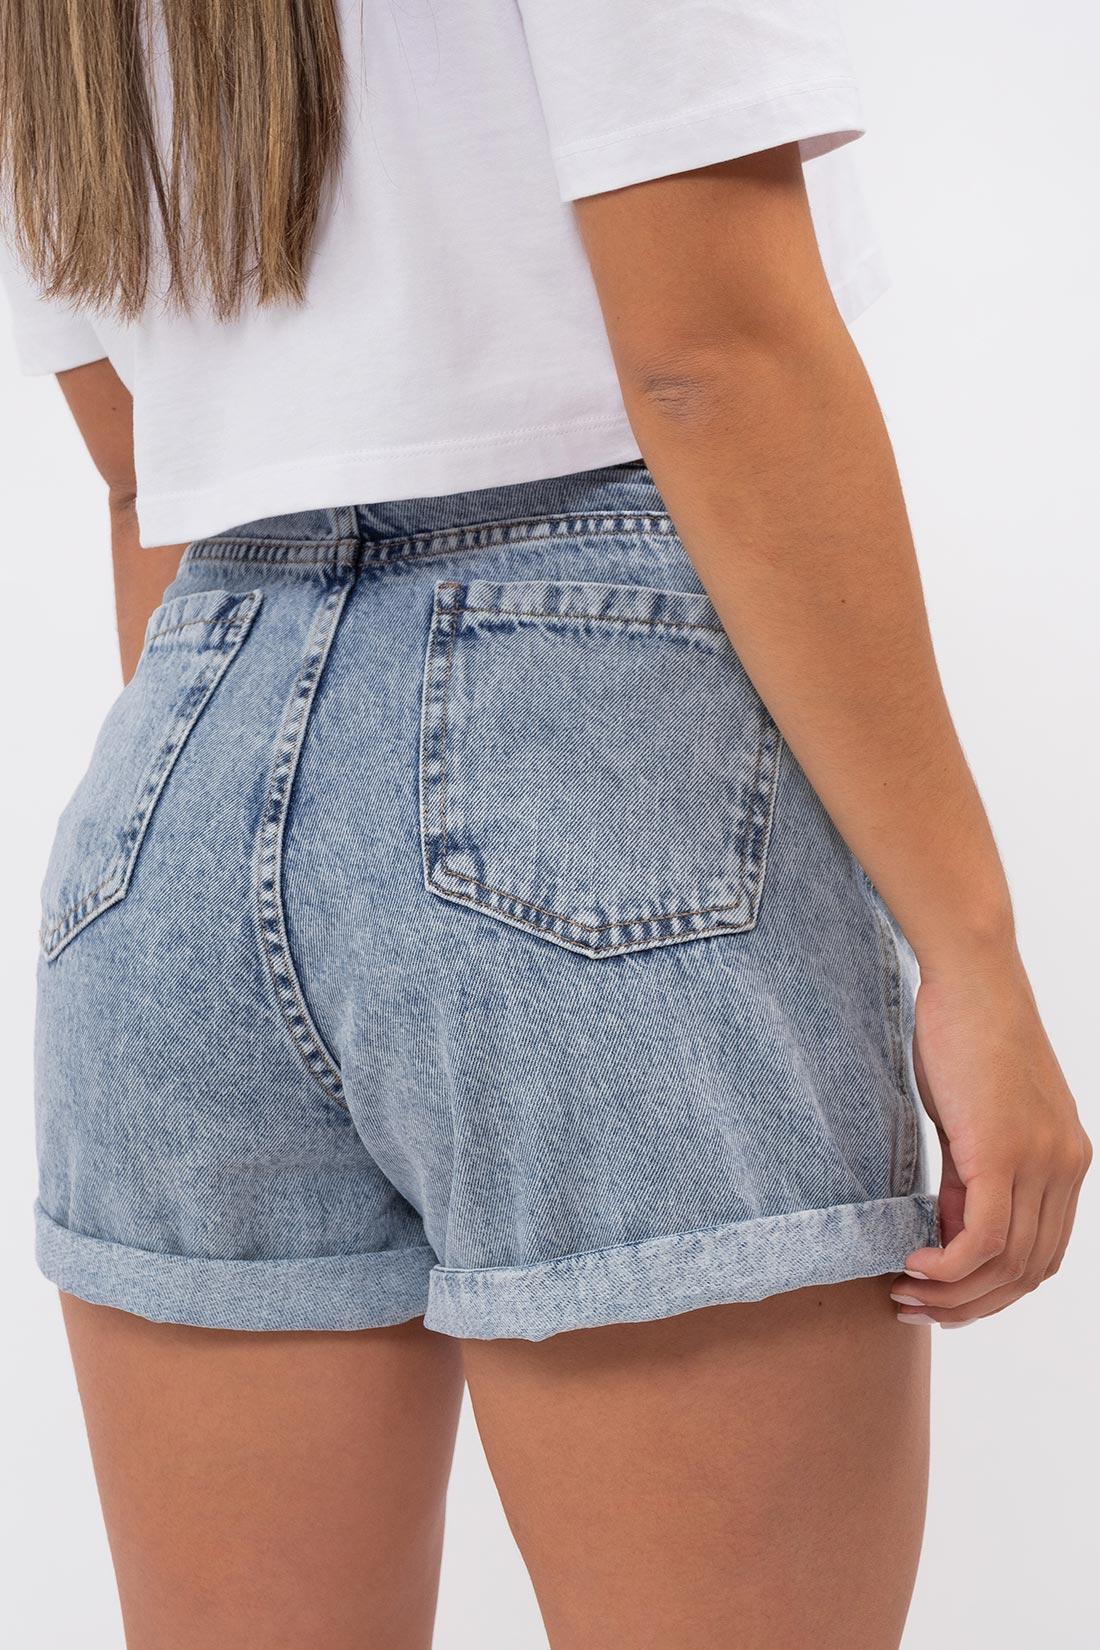 Shorts Jeans Hering Mom Barra Dobrada